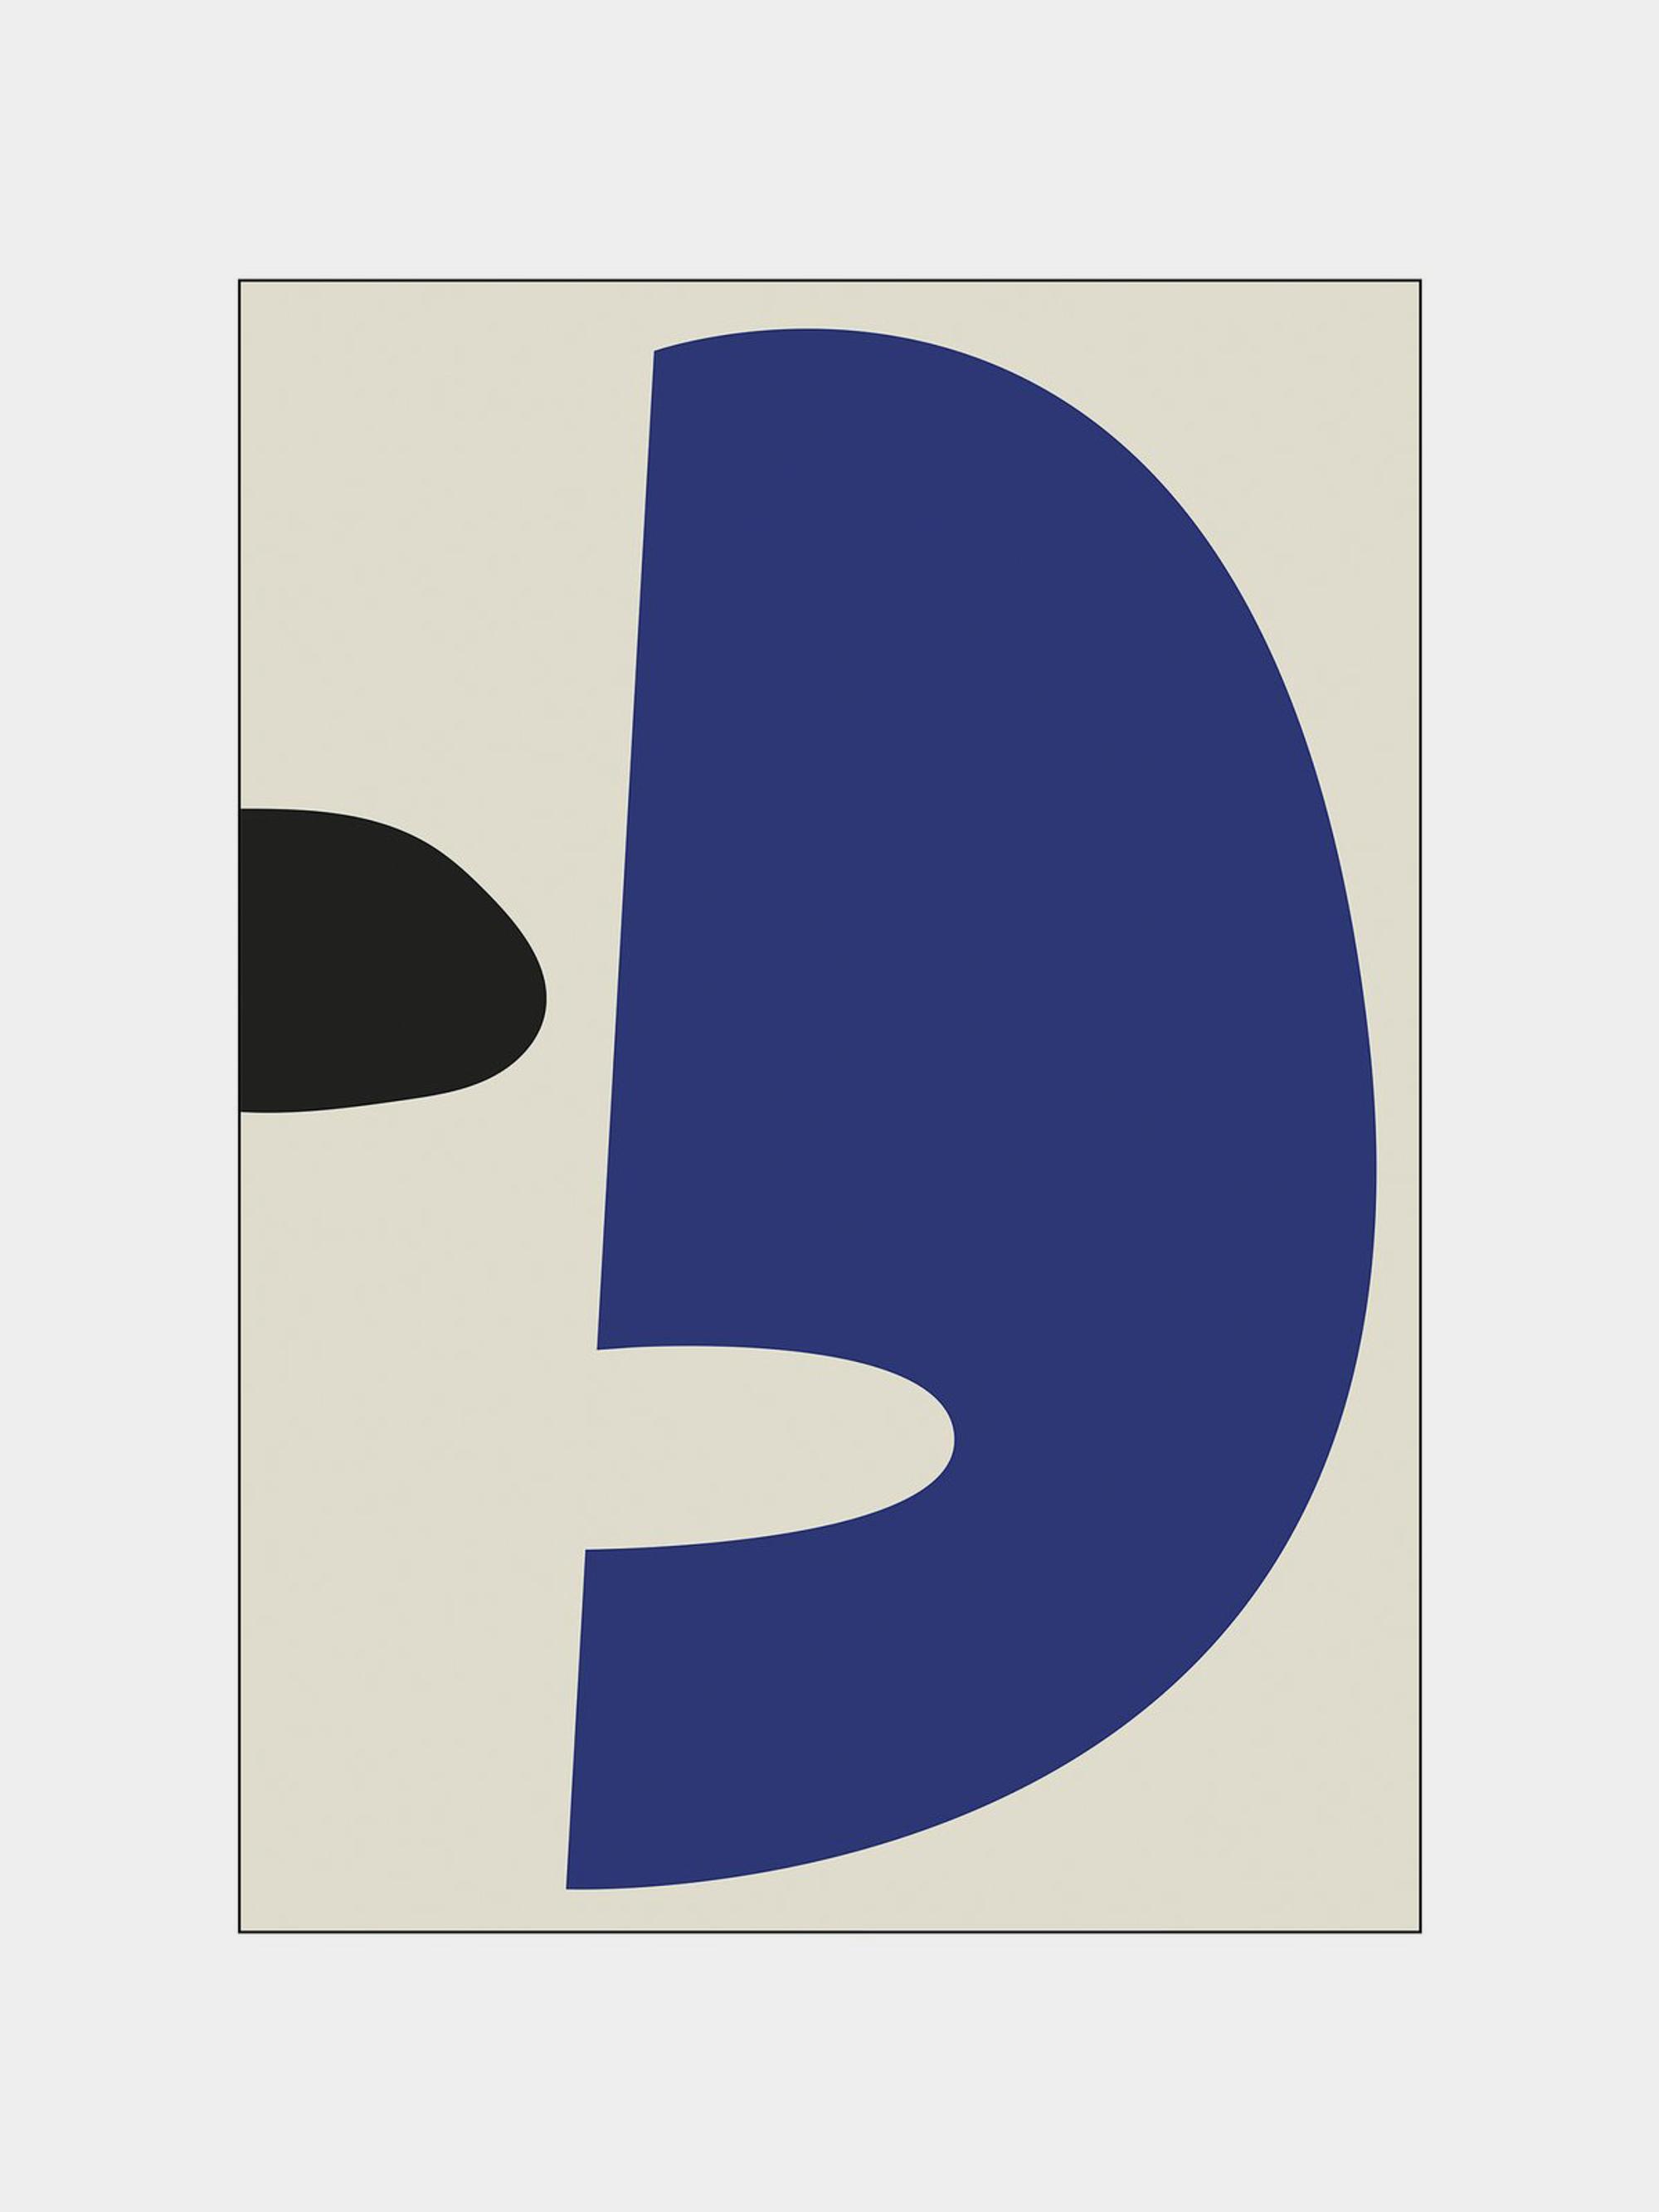 33390_0656c0e5ec-somee-wular-blue-black-30x40cm-freja_1600x-zoom.jpg